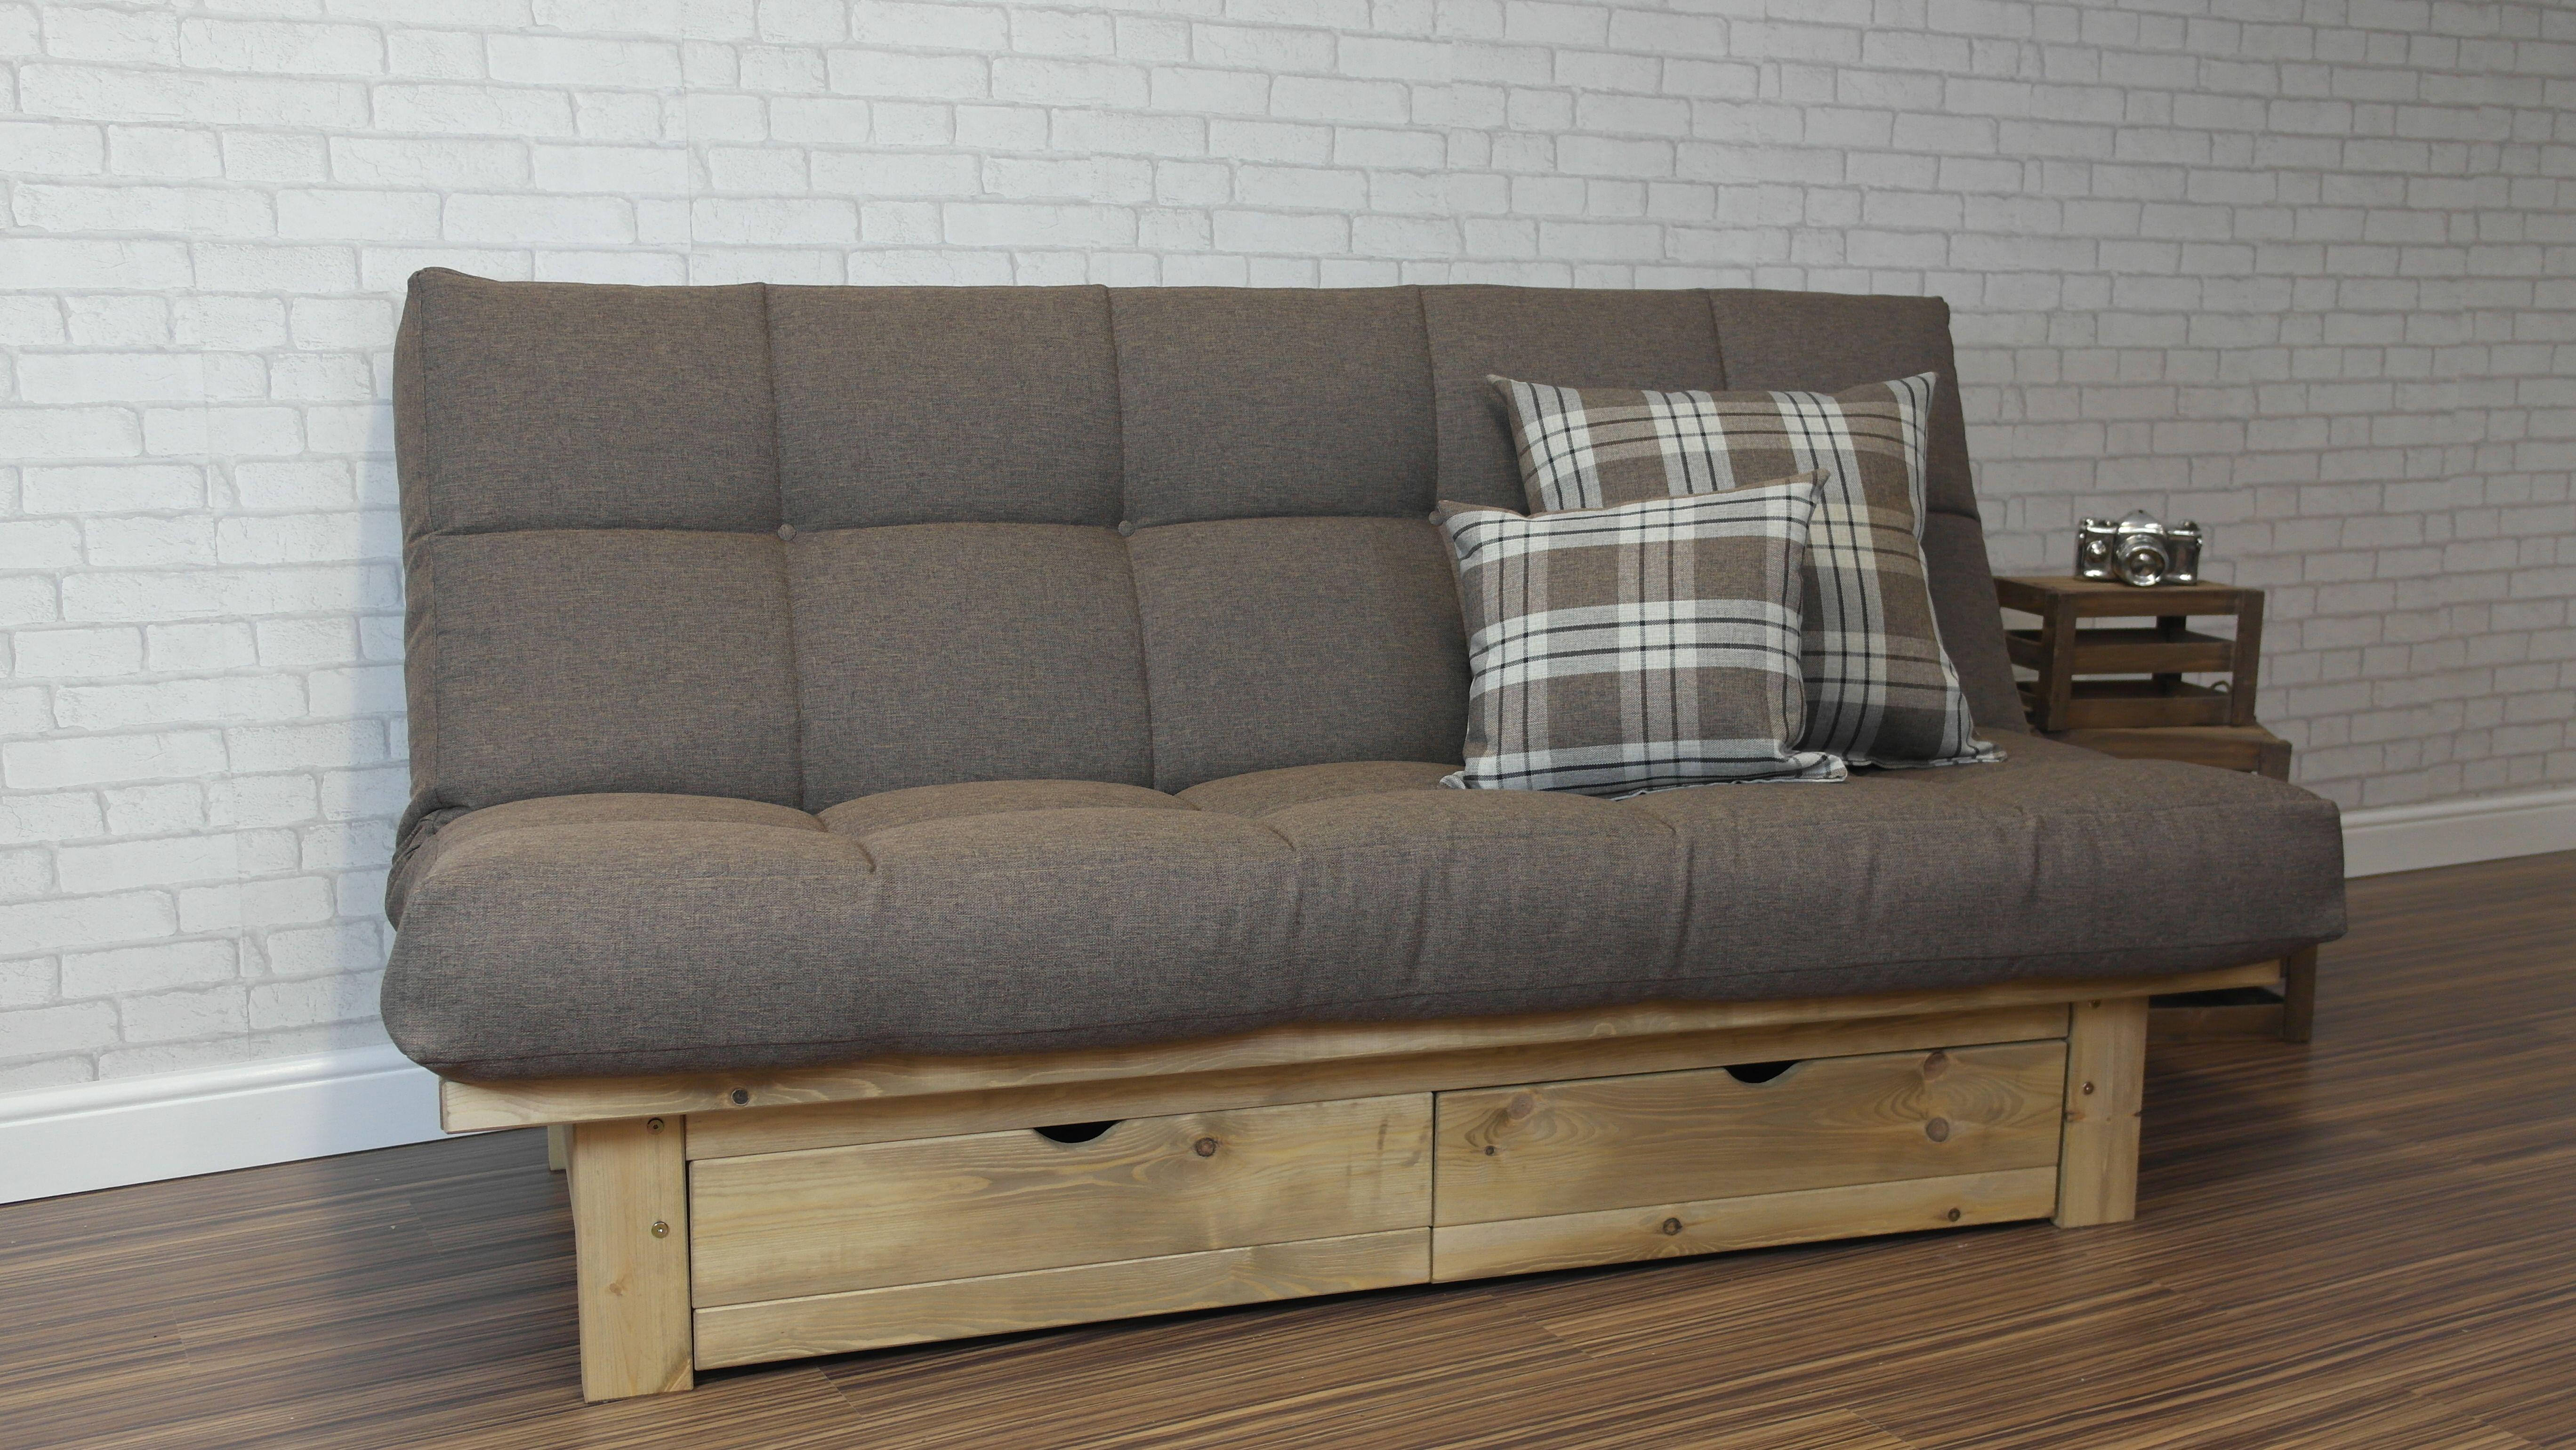 sofa bed futon style maze rattan half moon corner set grey beds